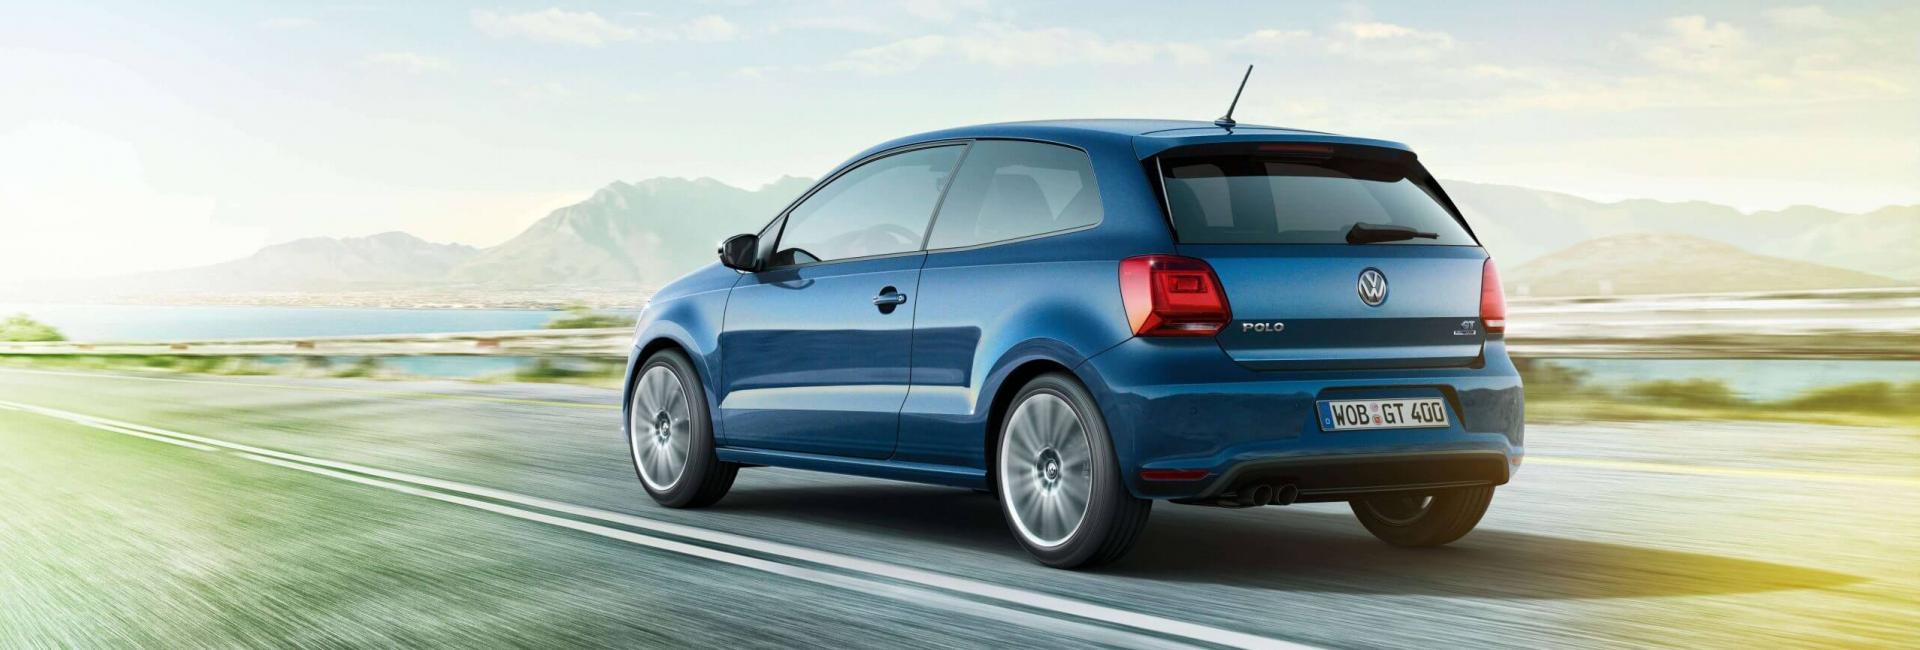 <p>Volkswagen POLO</p>